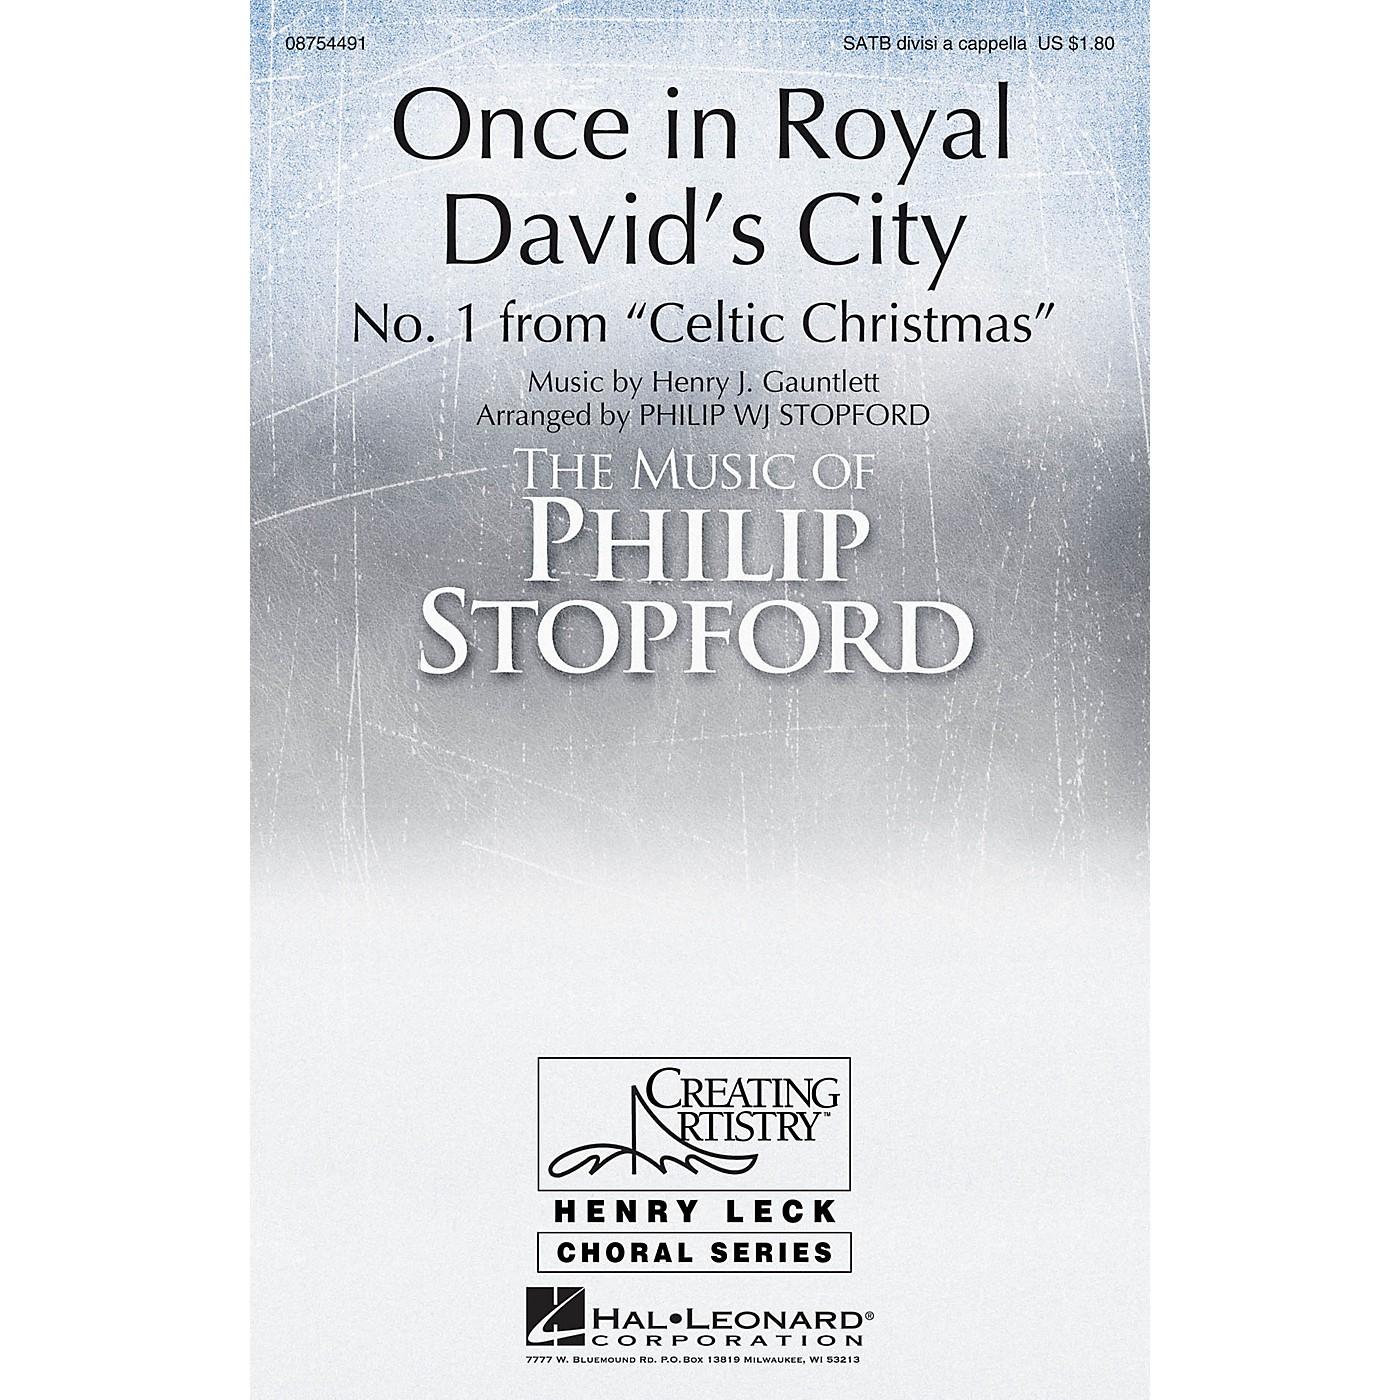 Hal Leonard Once in Royal David's City SATB Divisi arranged by Philip Stopford thumbnail